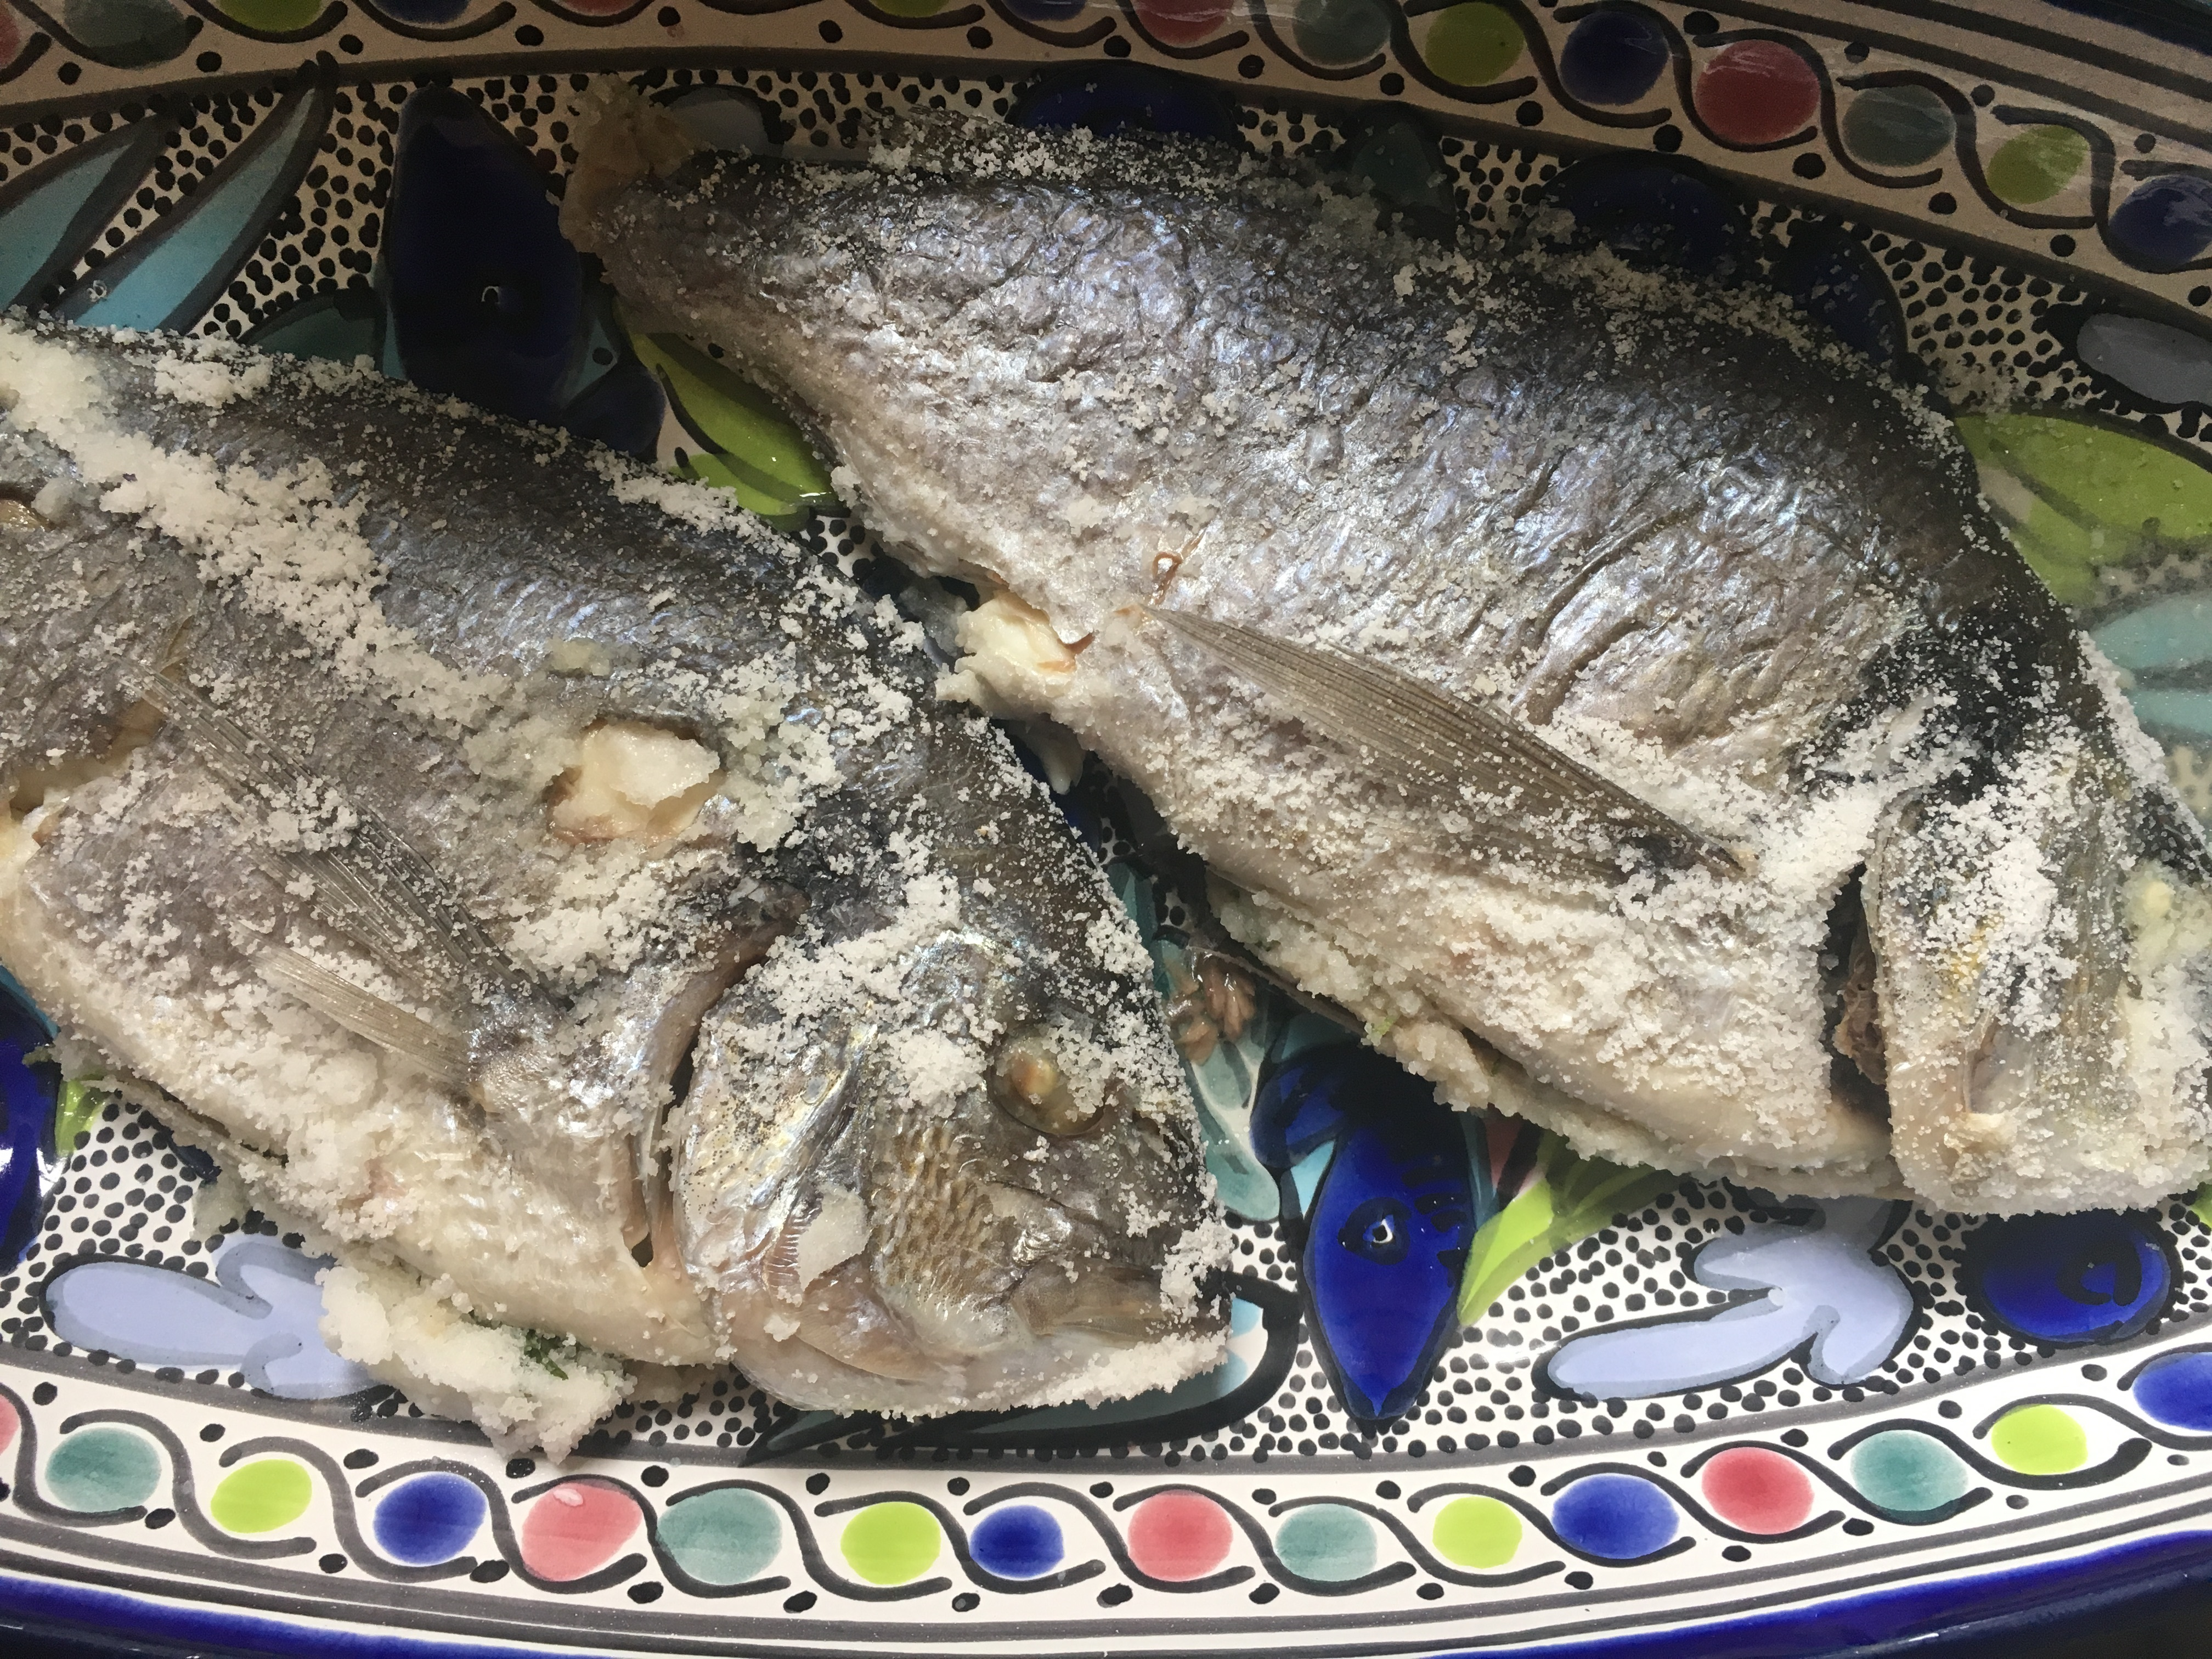 Sókéreg alatt sült hal